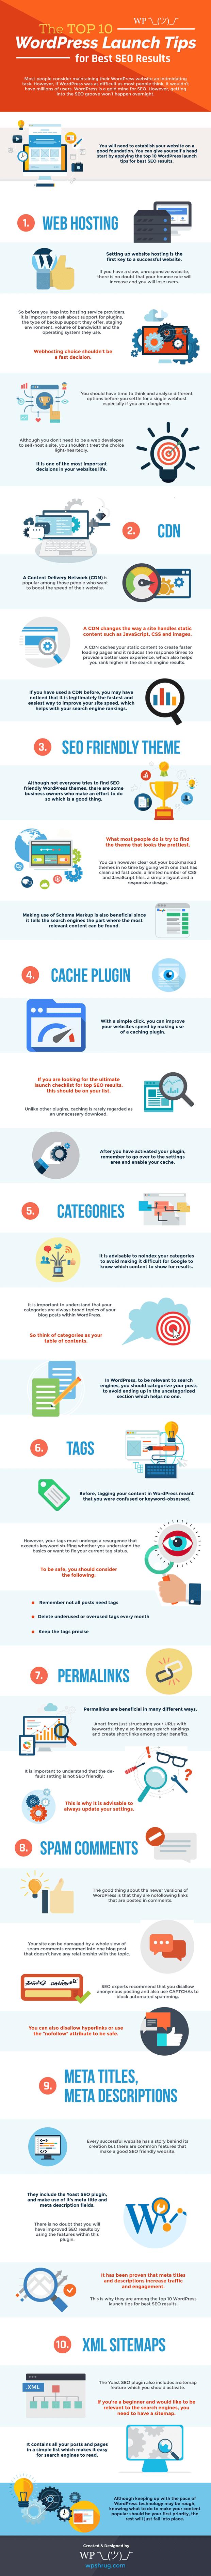 top wordpress launch tips best seo results